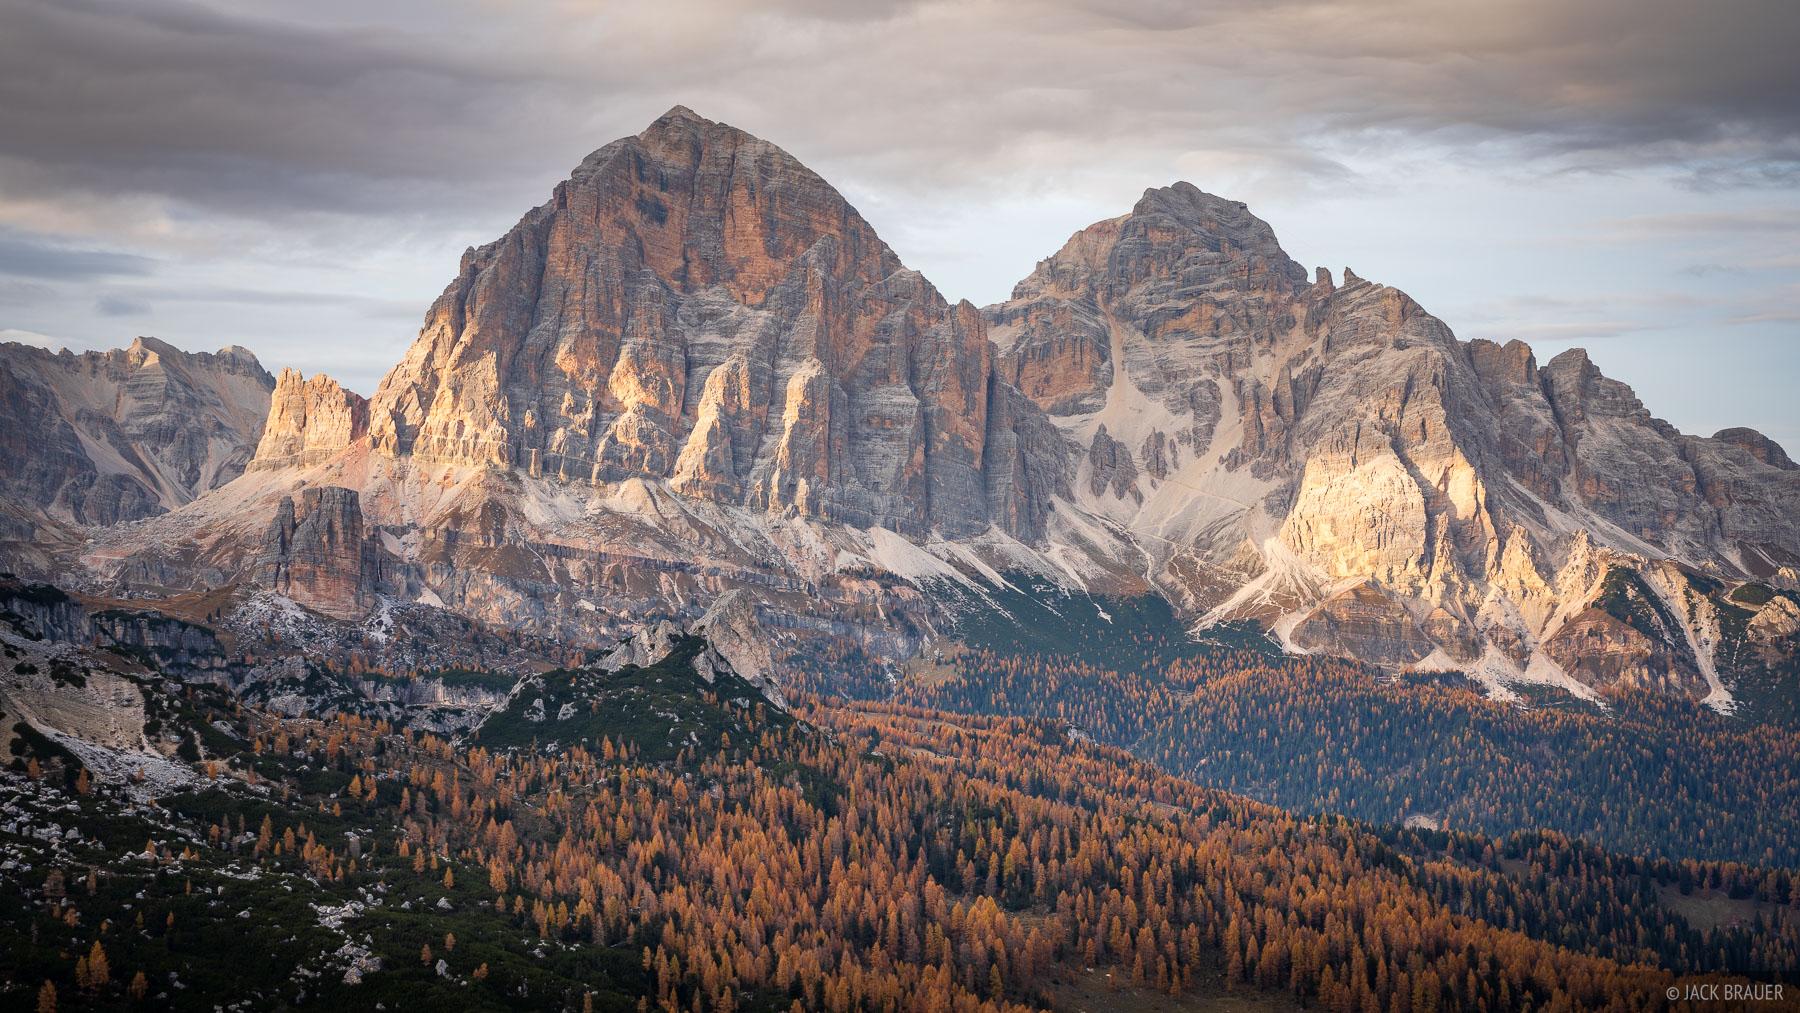 Dolomites, Italy, Passo Giau, Tofana de Rozes, larch, October, Alps, photo